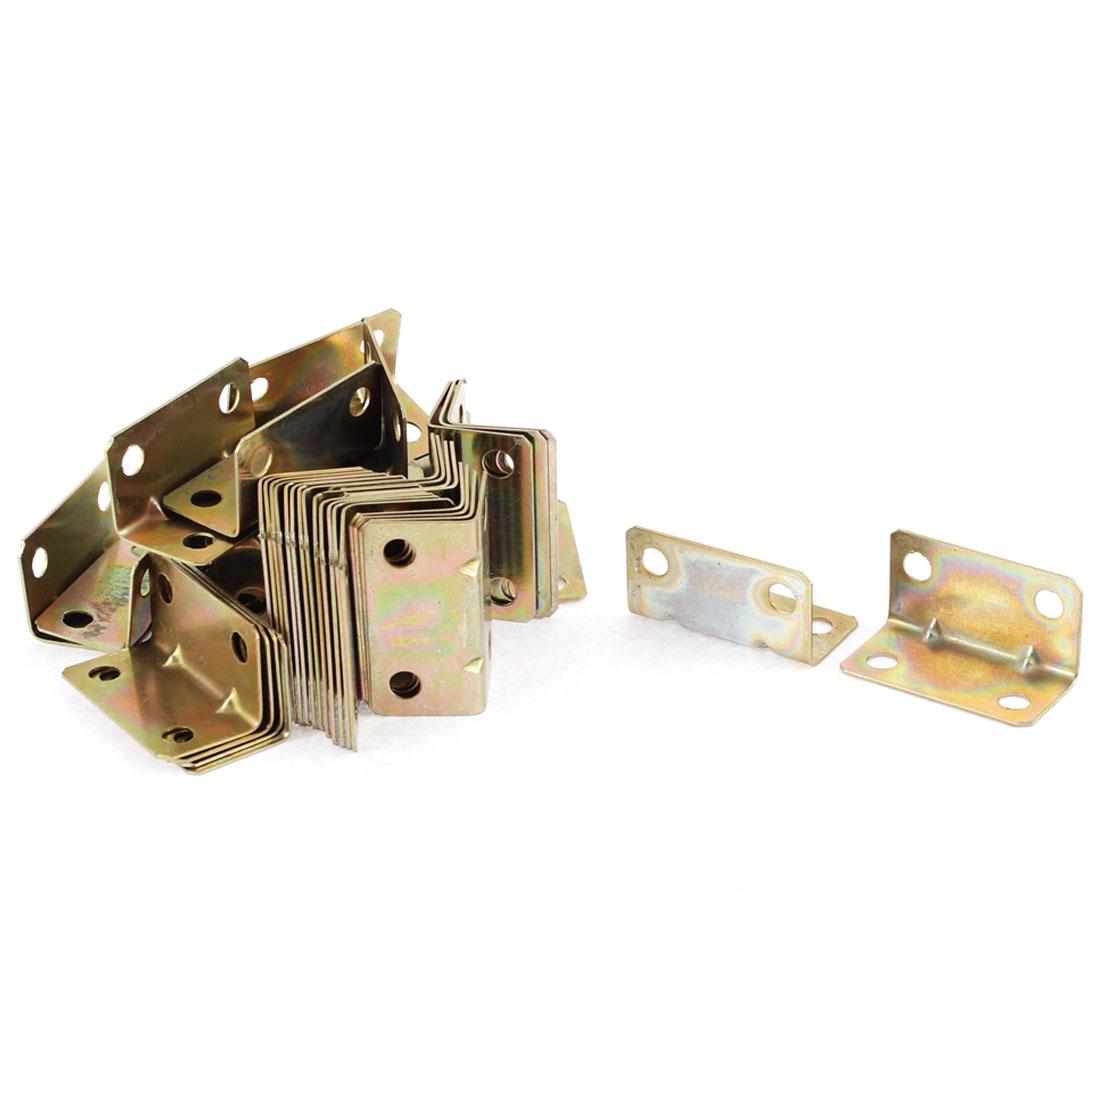 Furniture Door 90 Degree Corner Angle Brackets Fasteners Support 16x16x32mm 50pcs